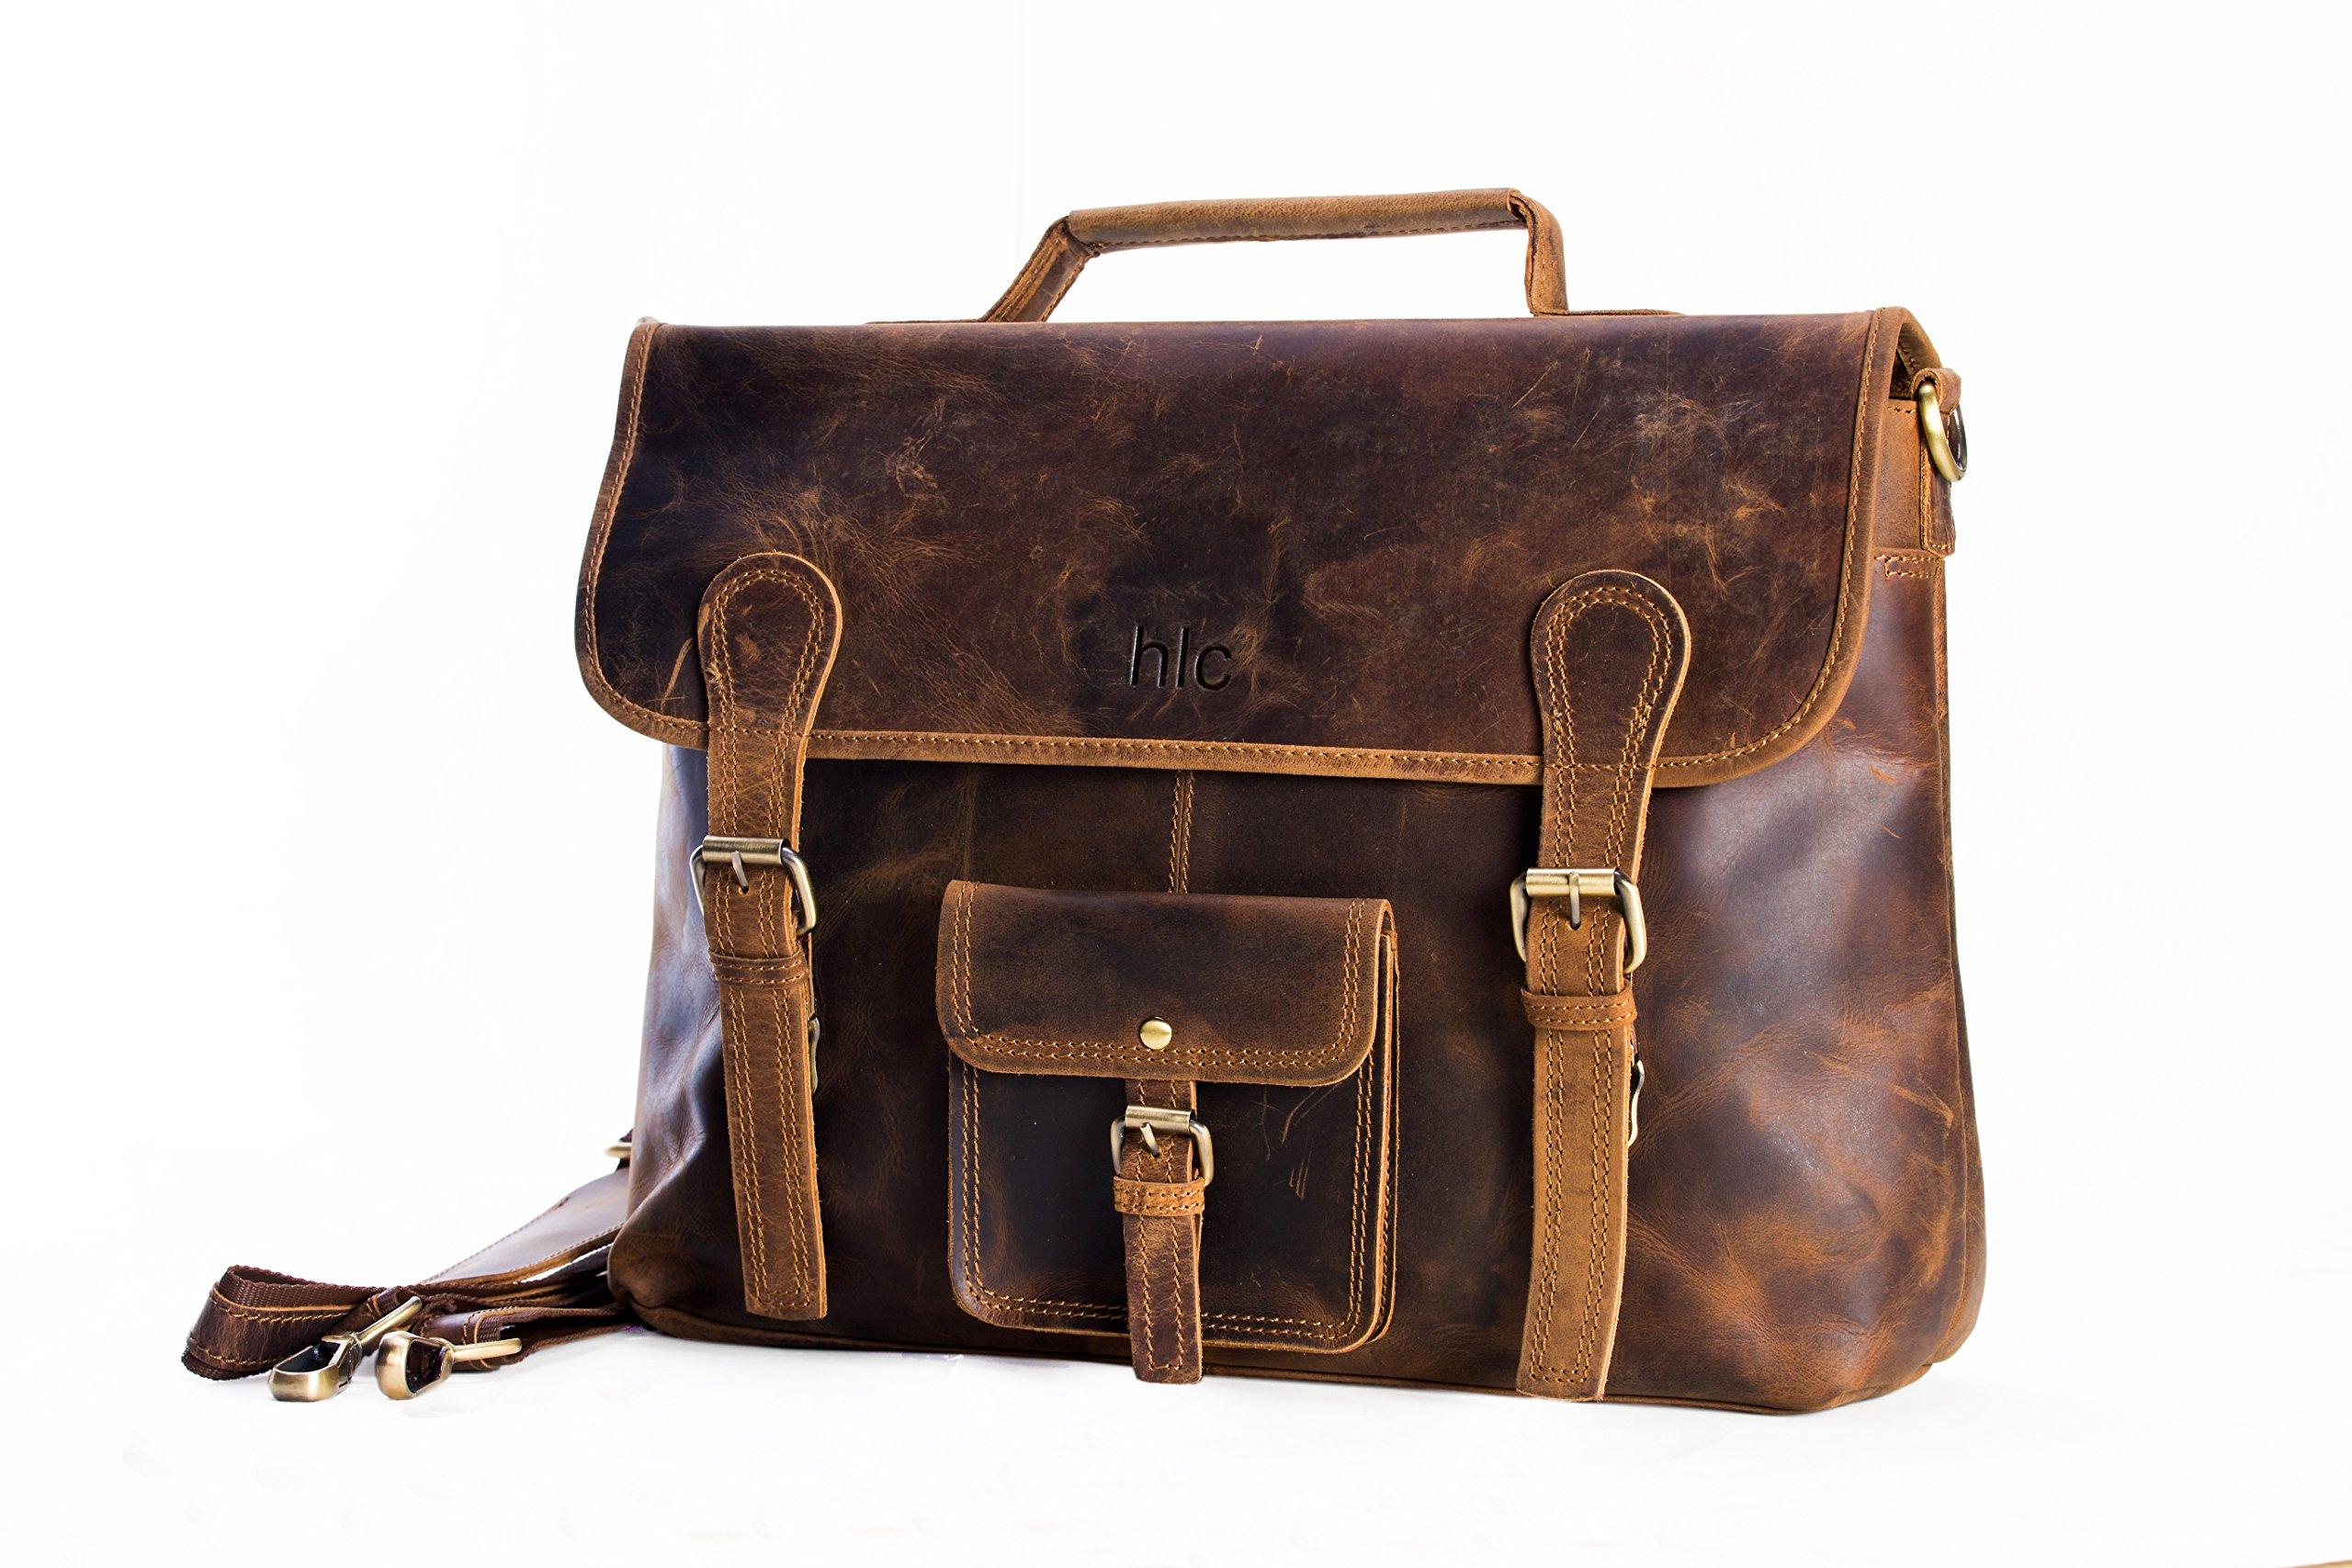 hlc 15'' crazy horse leather messenger satchel unisex laptop briefcase bag for men and women